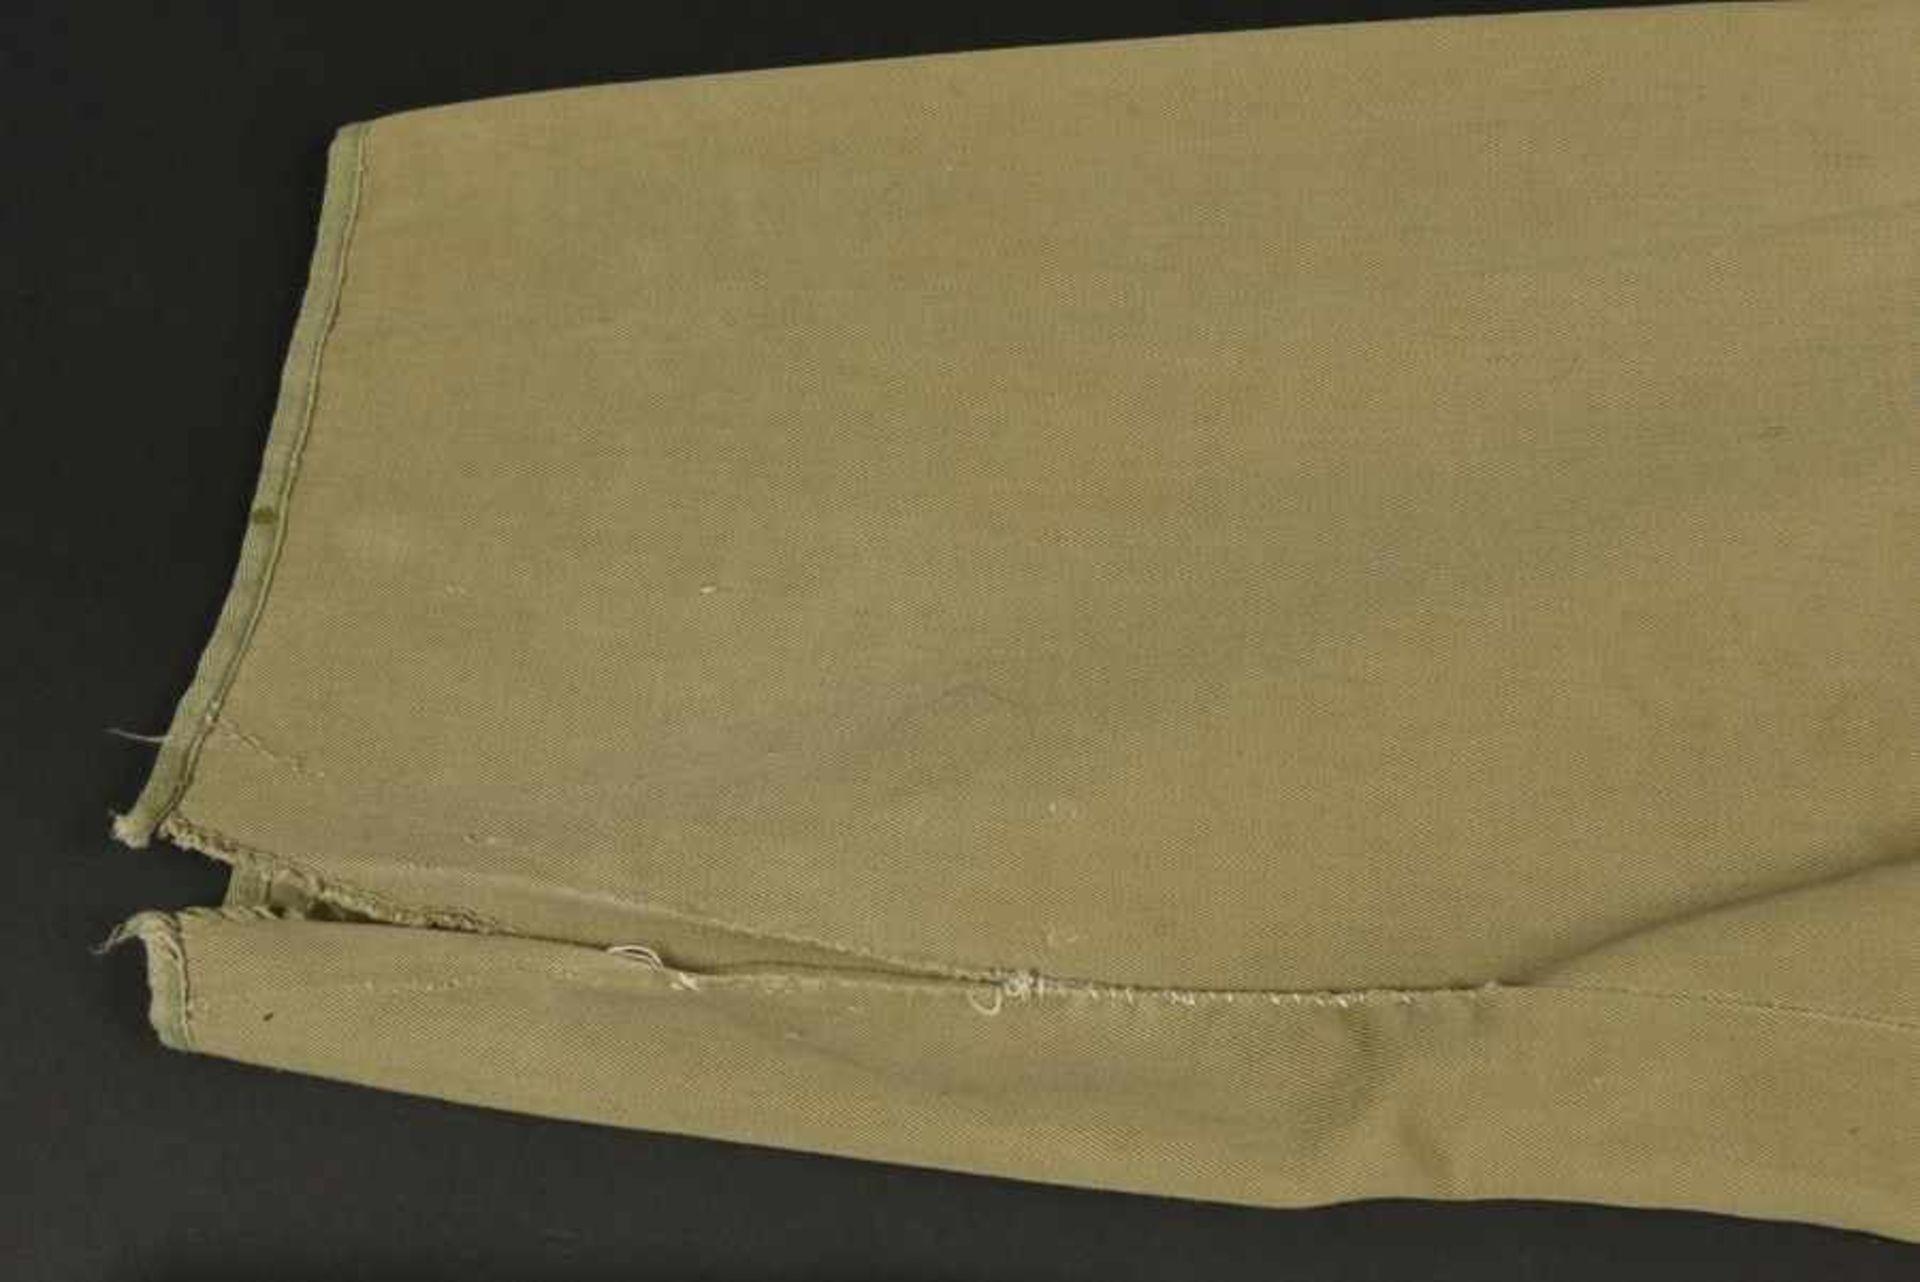 Los 28 - Pantalon du parachutiste américain B Orsborn. Pants of American paratrooper B OrsbornEn popeline,